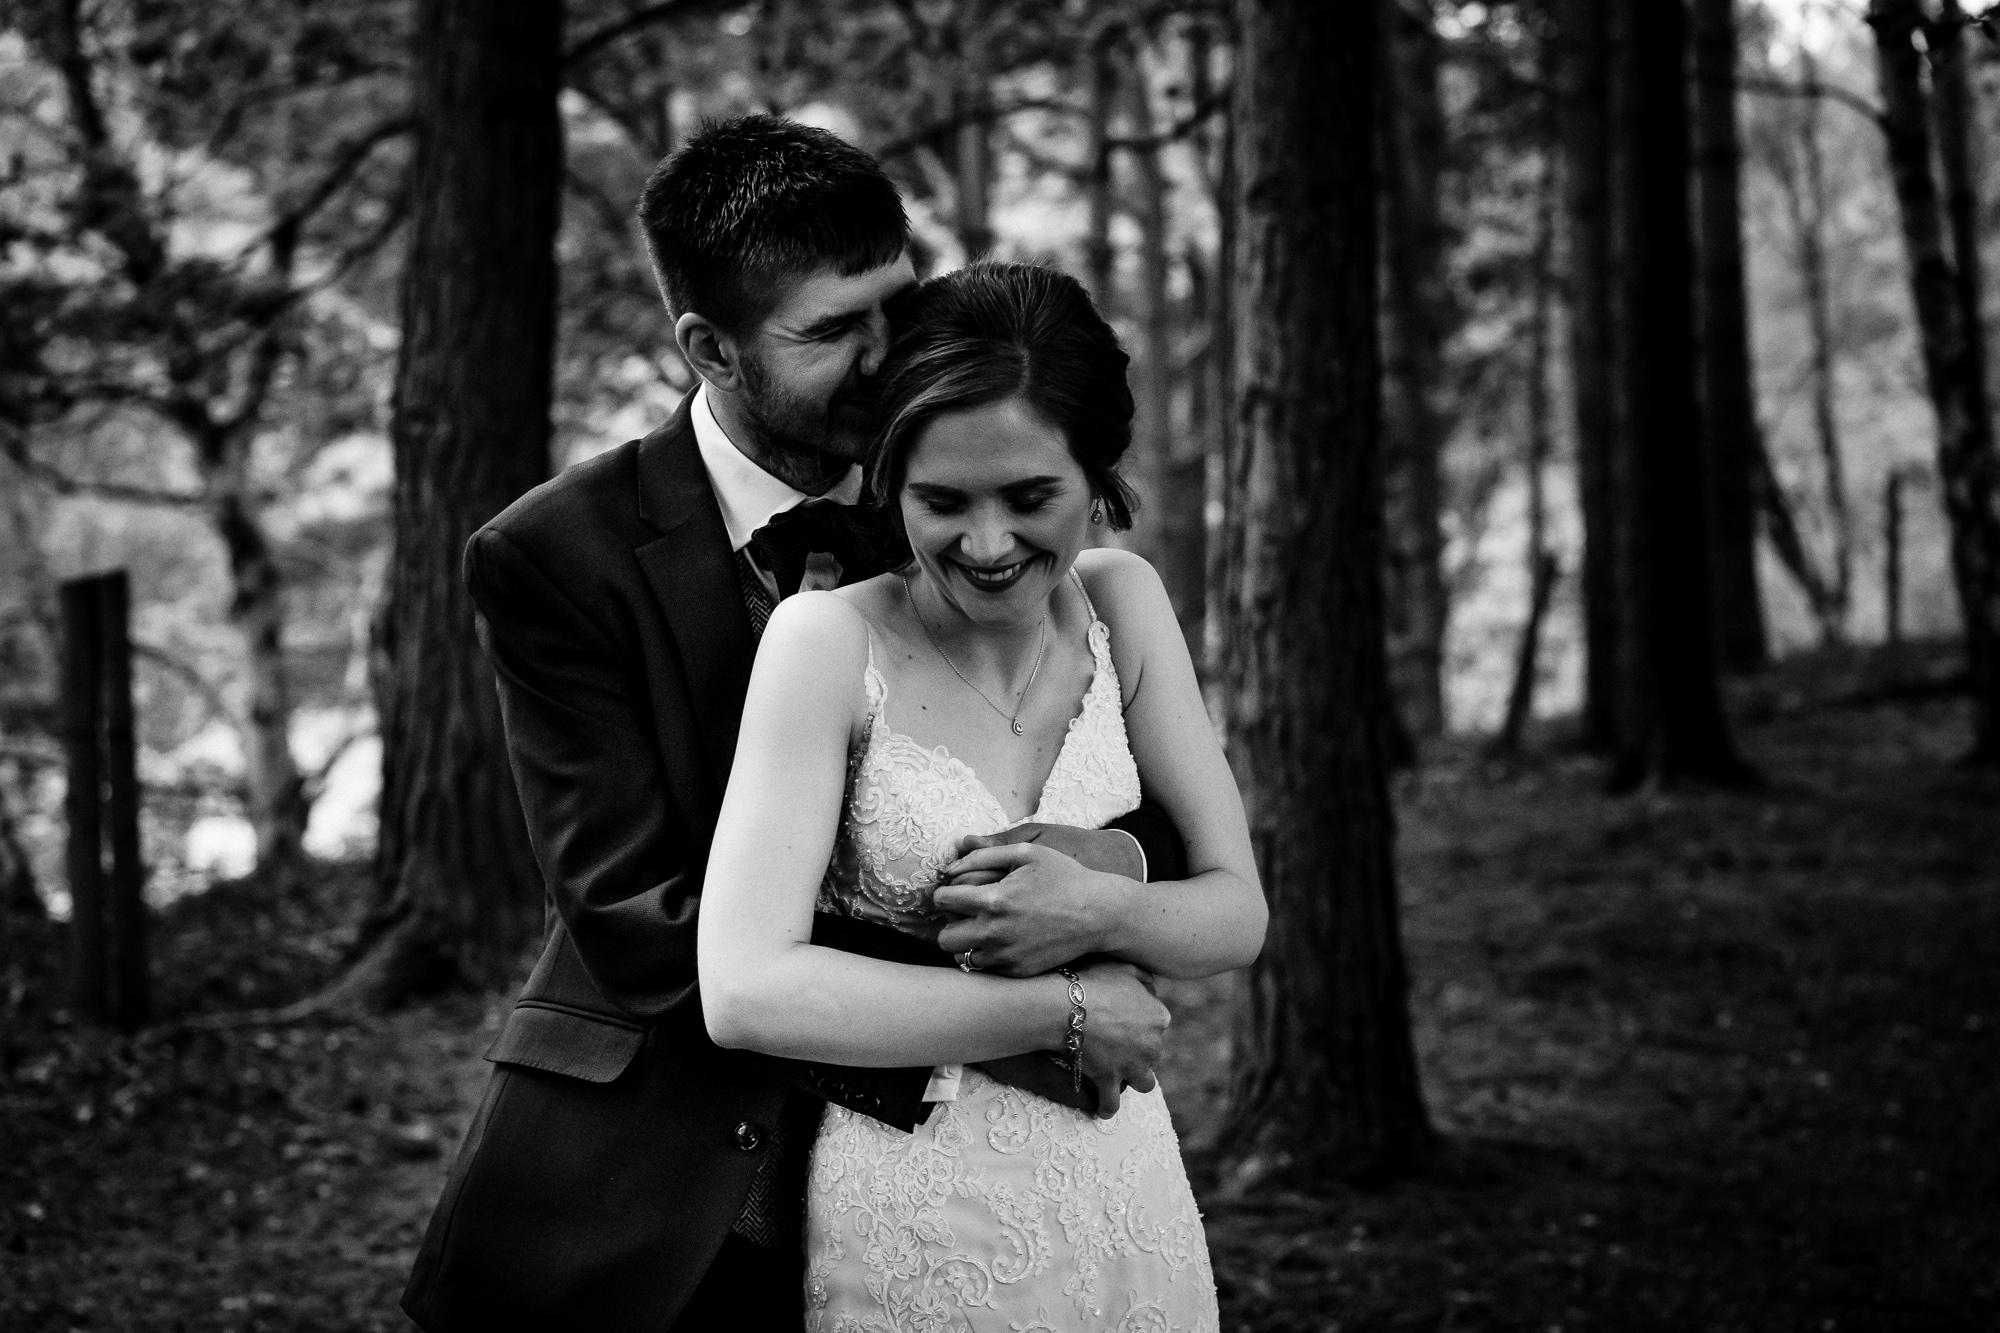 Nunsmere Hall Hotel Wedding photograhpy in cheshire wedding photographer (36 of 42).jpg